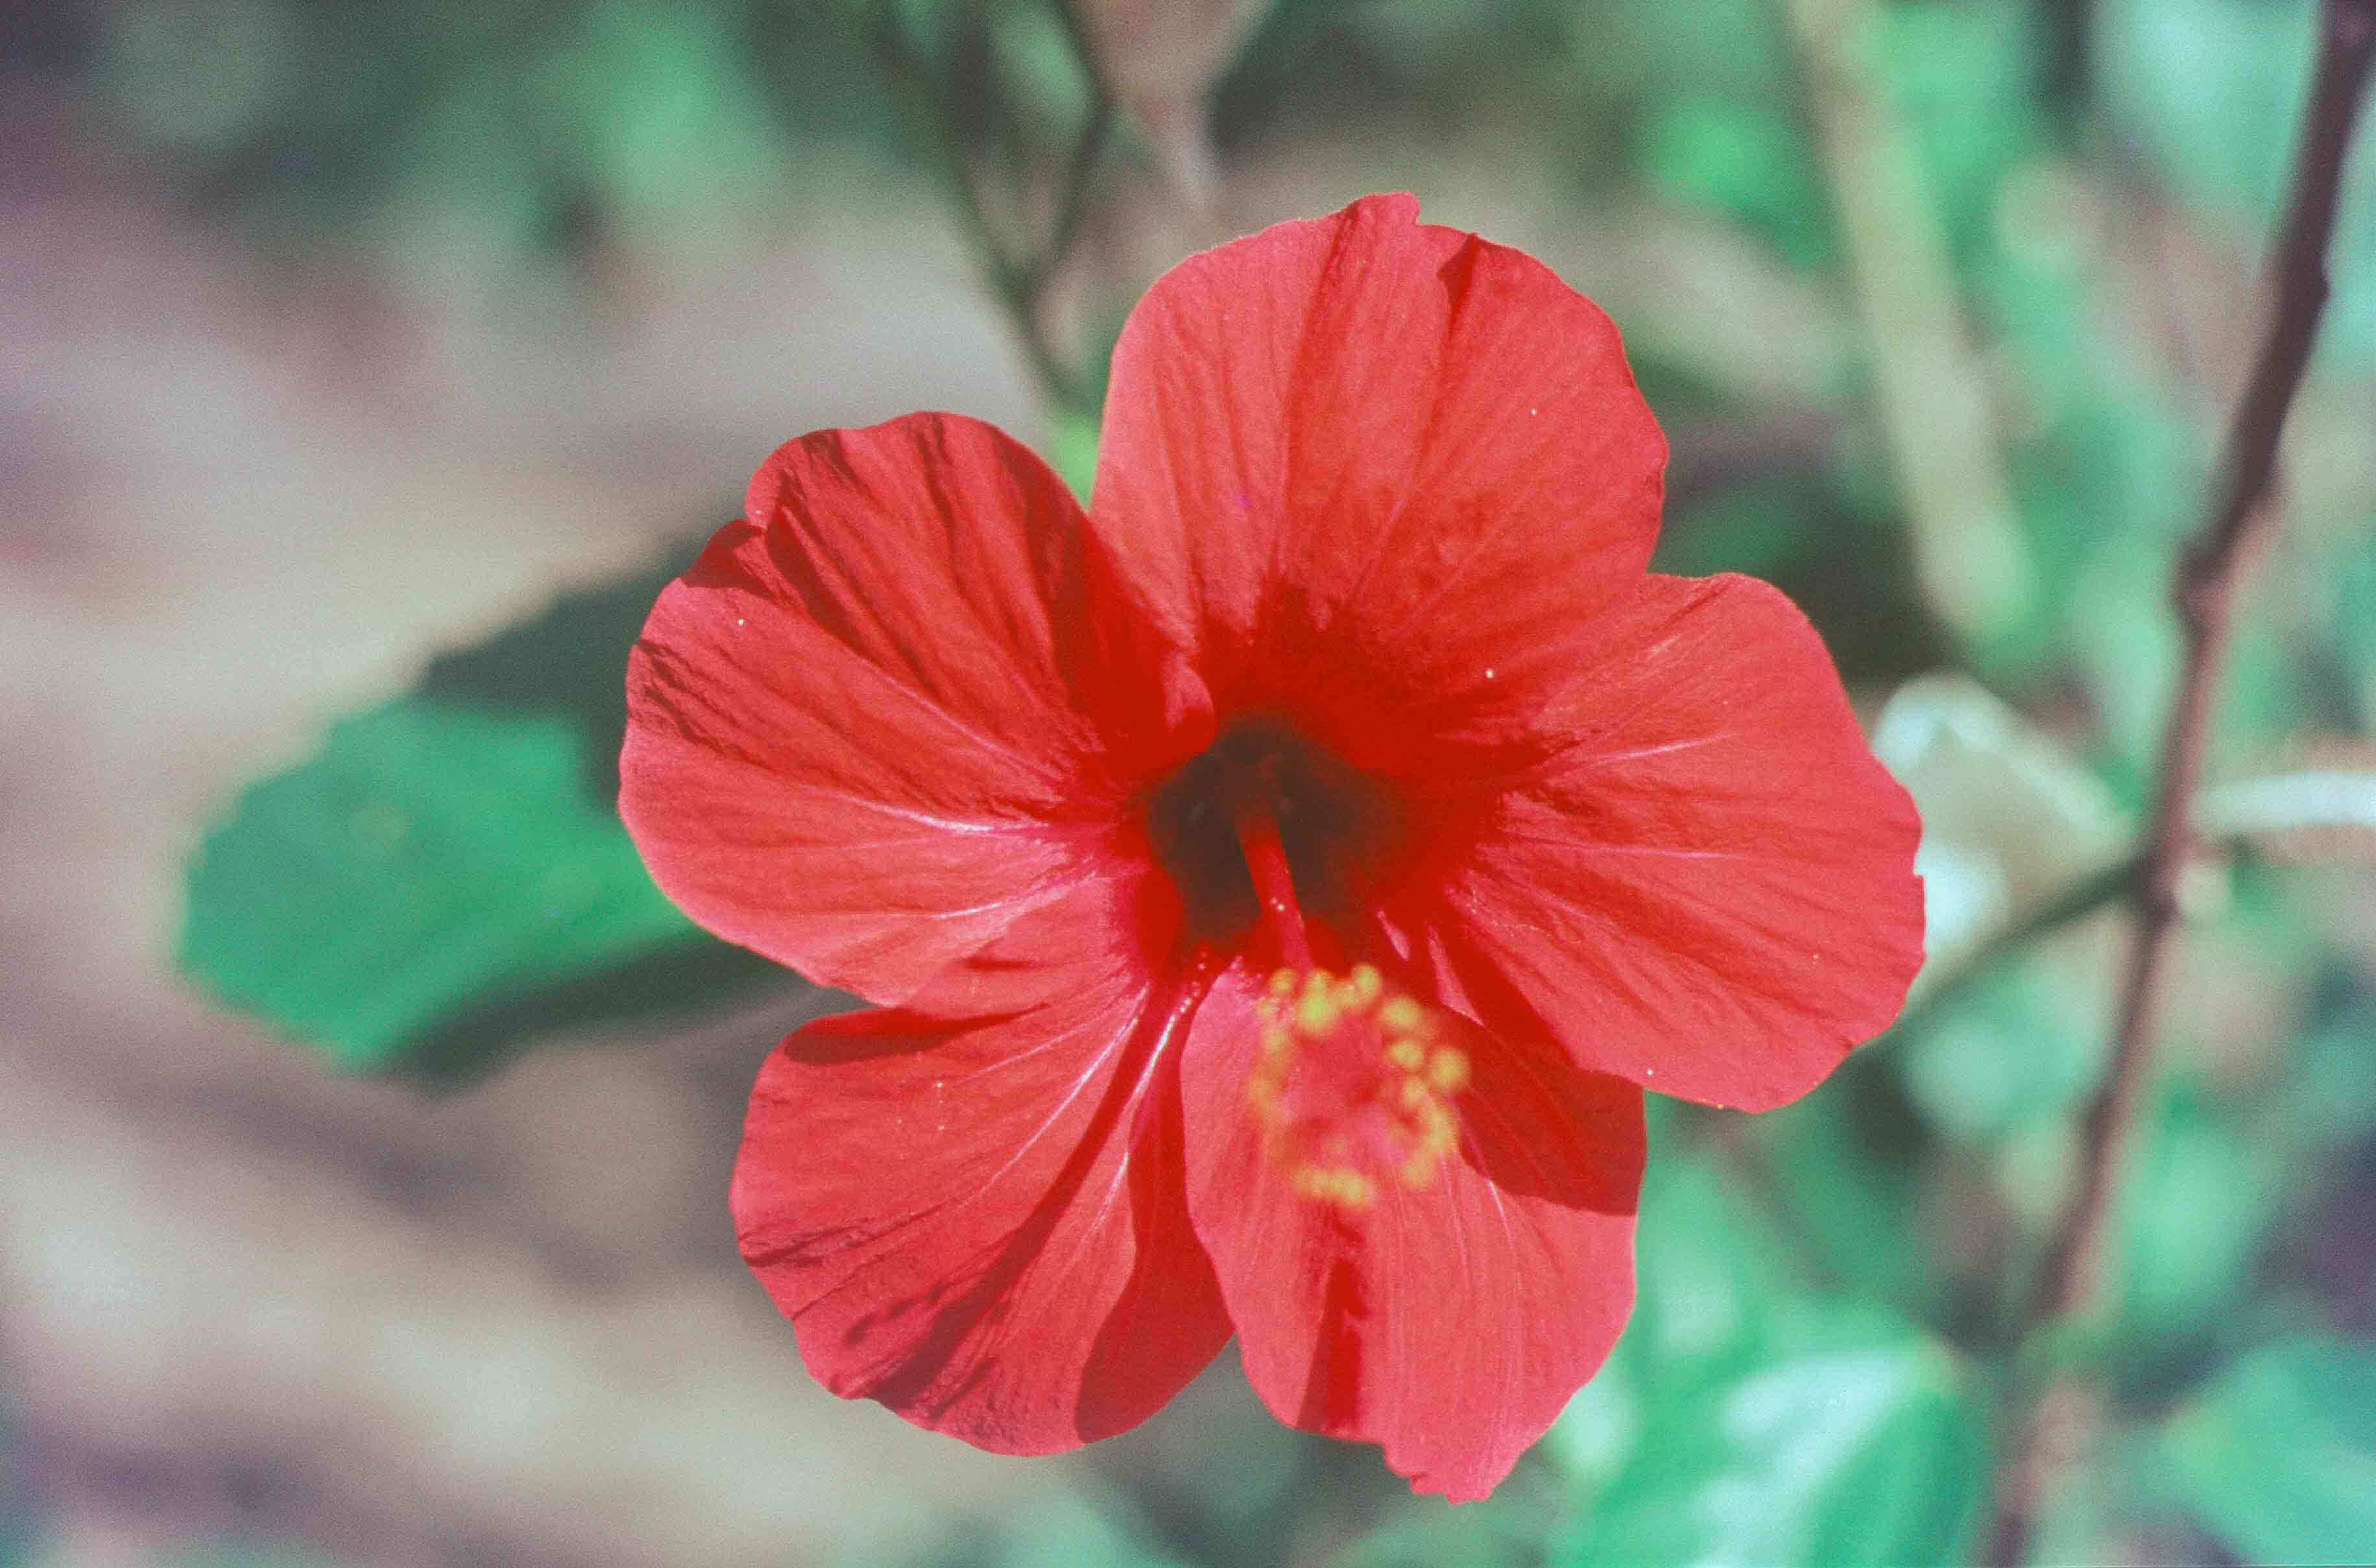 198. Suriname